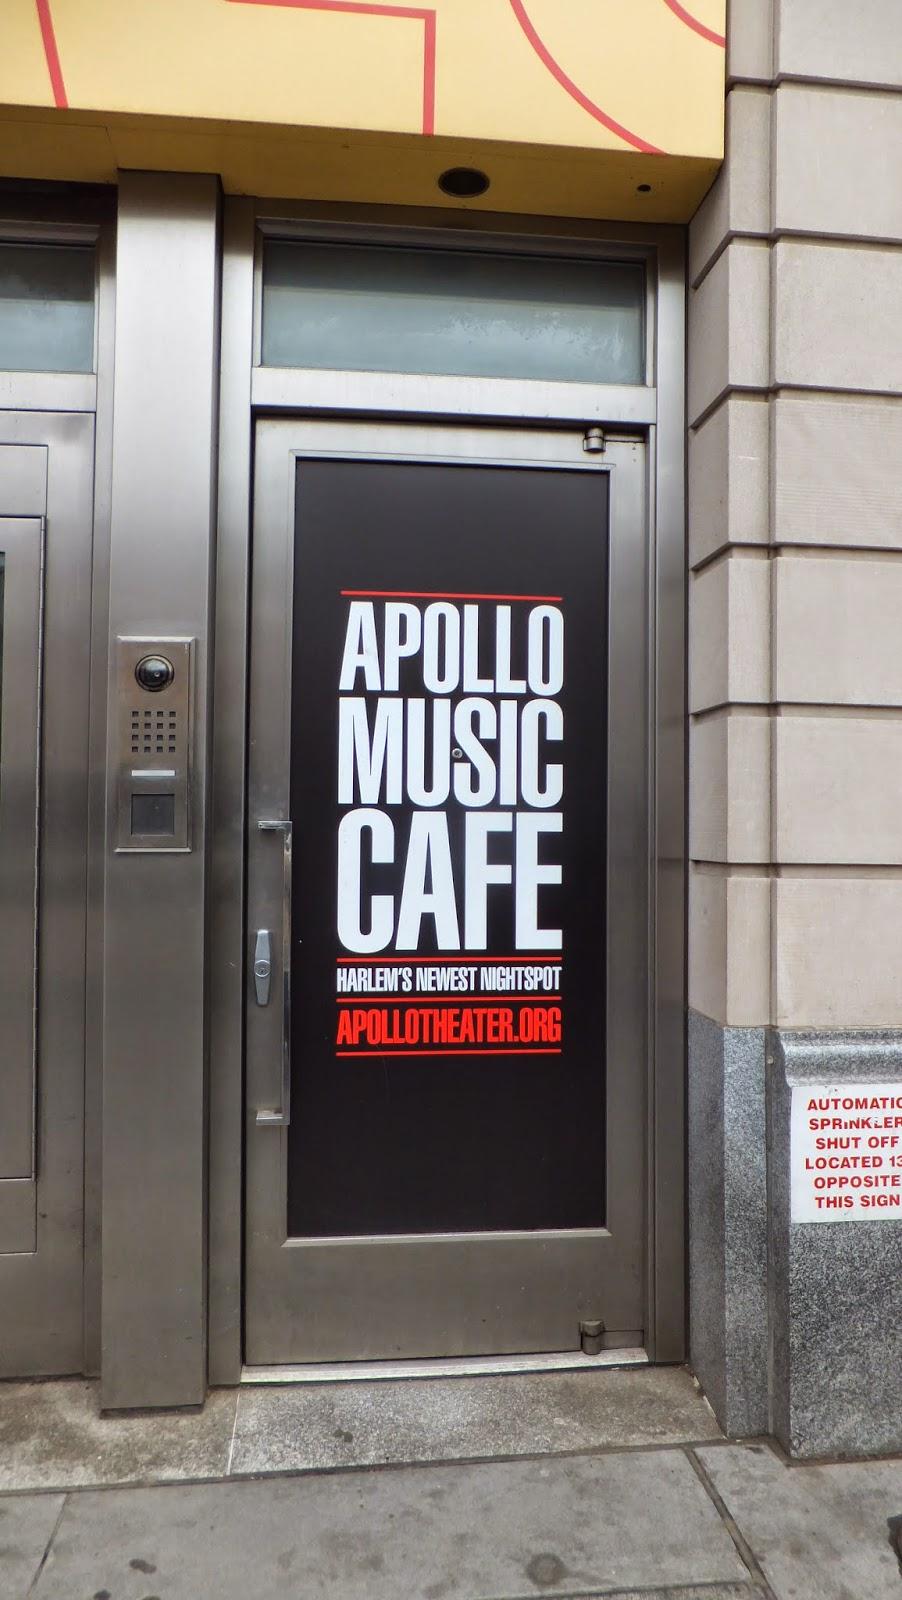 Apollo Music Cafe, Apollo Theater, Harlem, Manhattan, New York, Elisa N, Blog de Viajes, Lifestyle, Travel